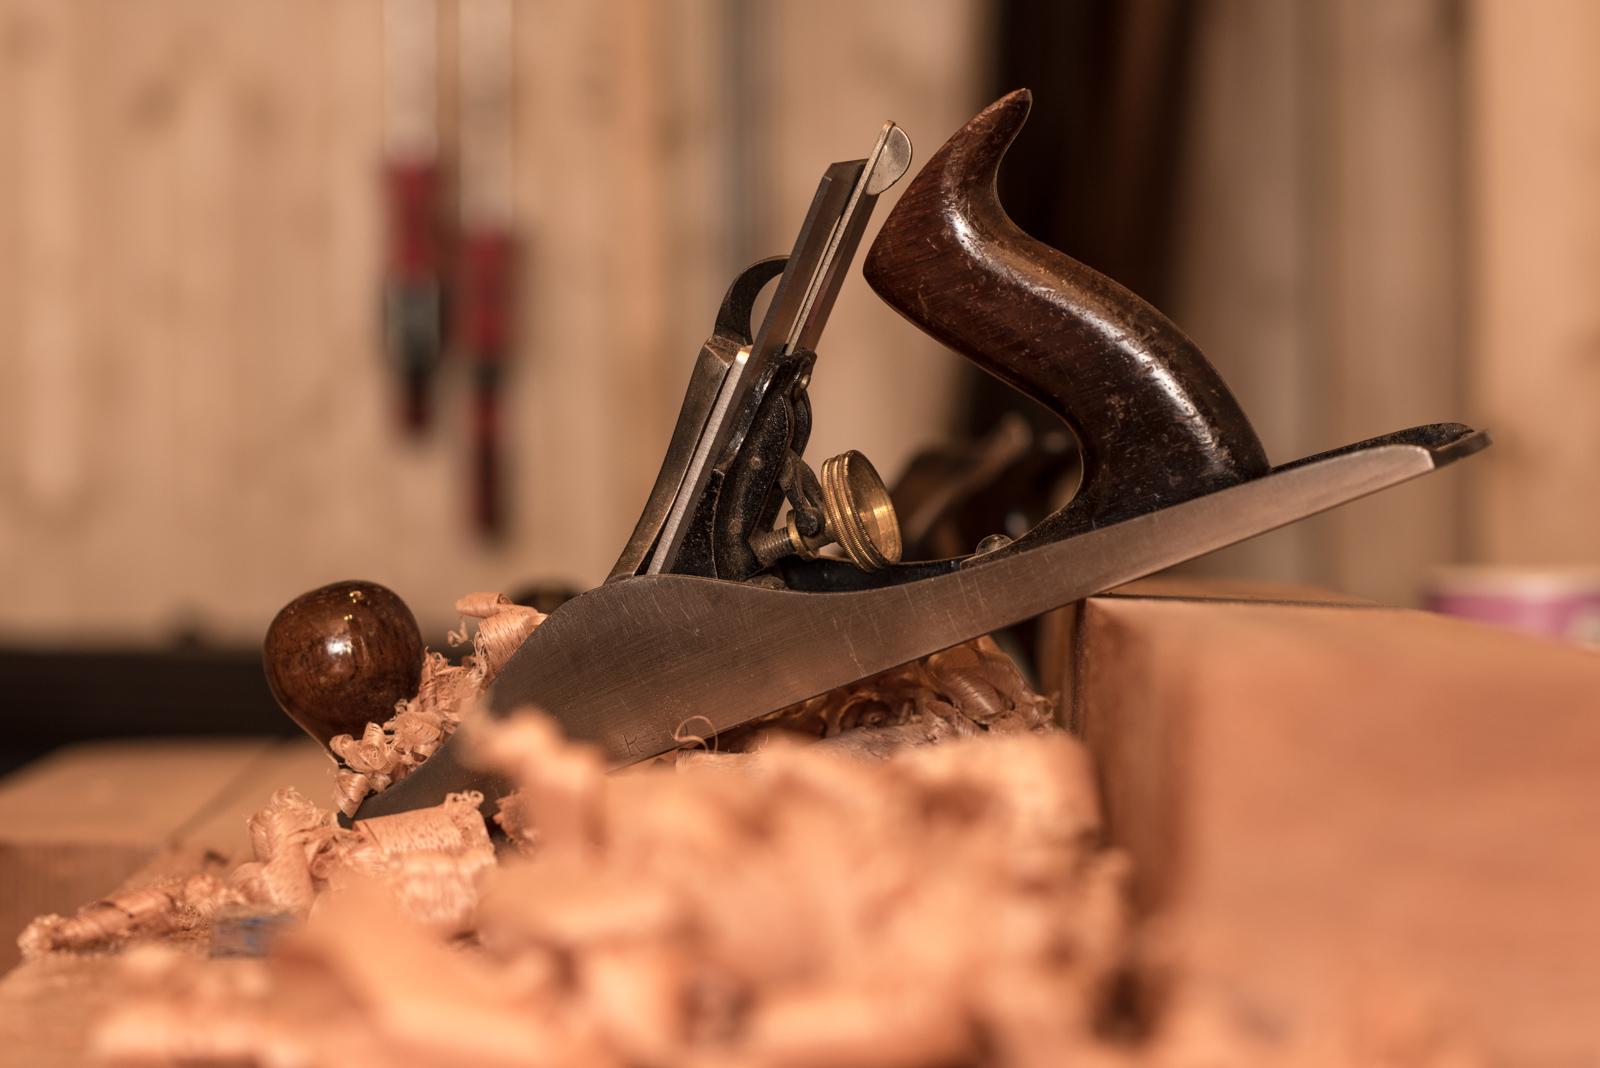 Werkplek houtbewerker Tweakhout door Josita Swarte Photography-54